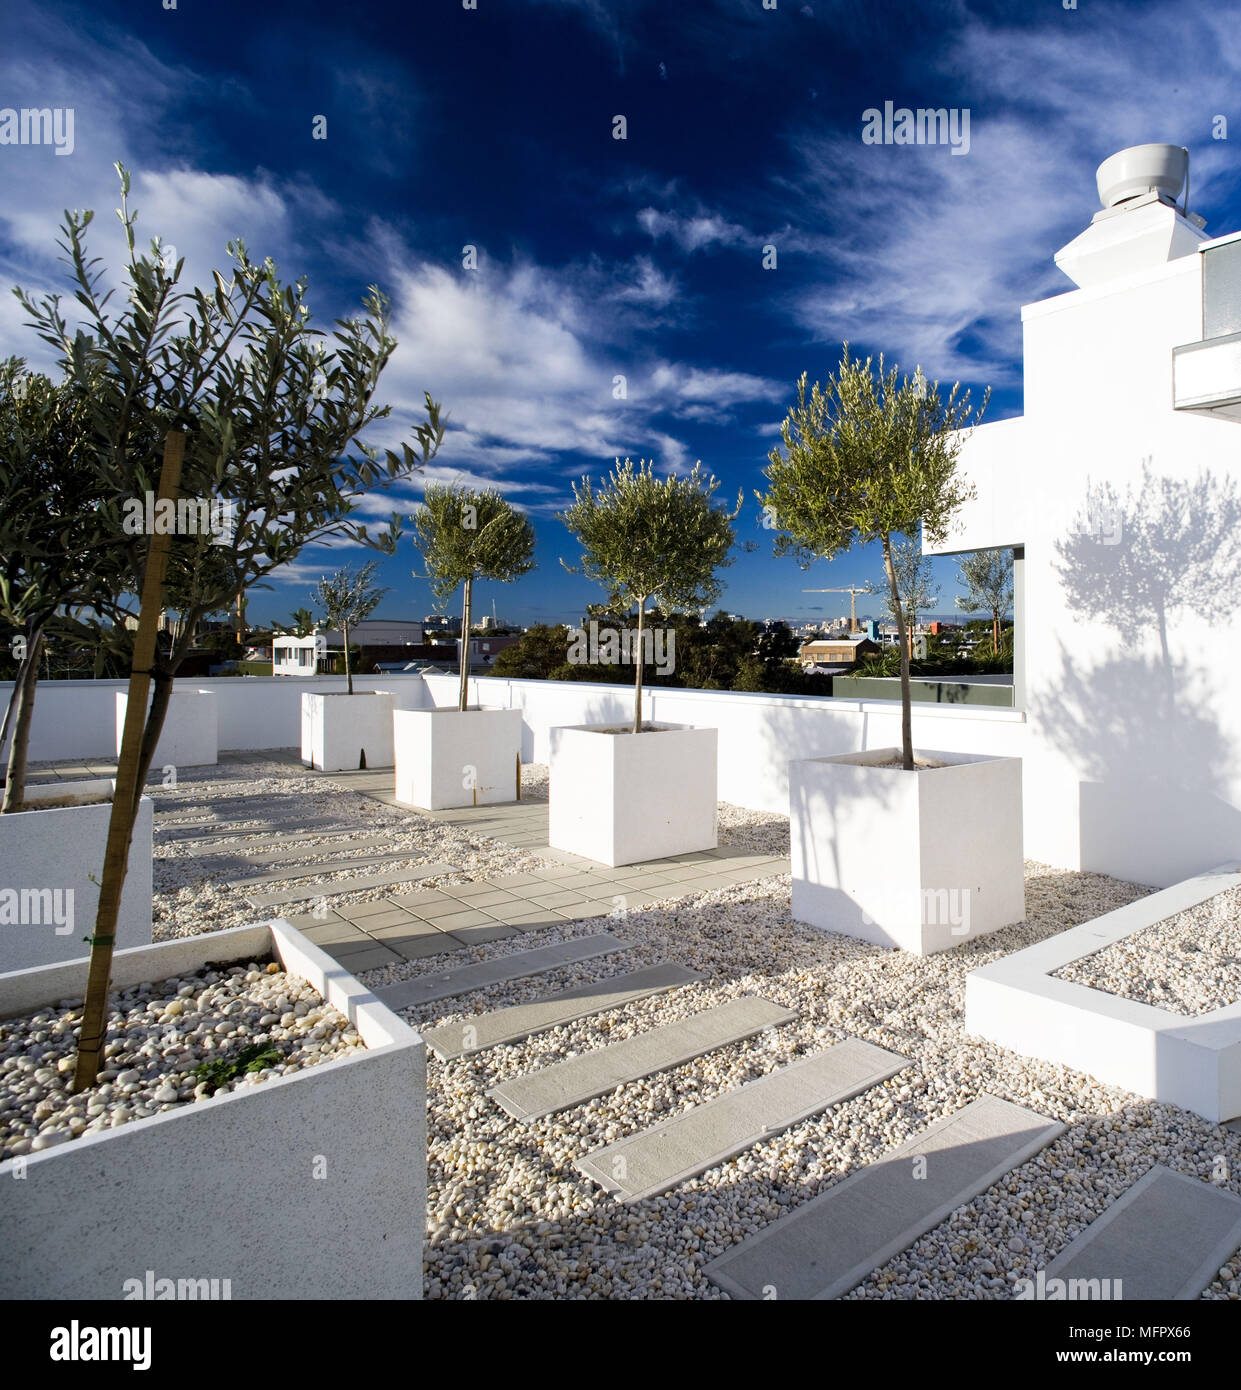 toit moderne jardin avec arbres en pots en pierre blanche banque d 39 images photo stock. Black Bedroom Furniture Sets. Home Design Ideas